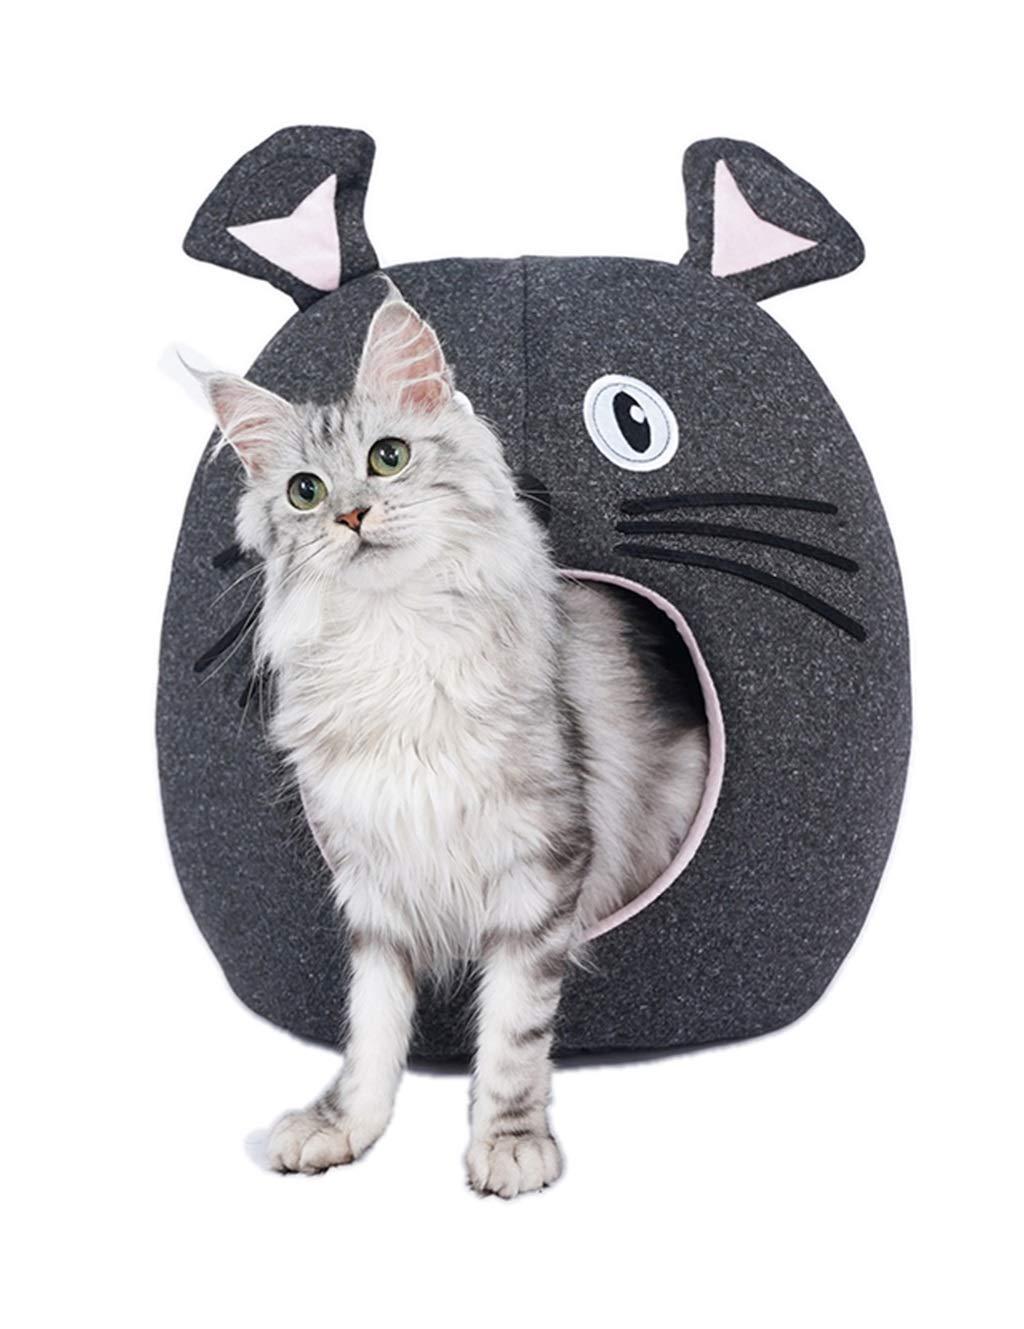 Cat Bed   Creative Cartoon Cat Bed   Semi-Closed Pet Nest Soft & Comfy Pet Supplies, 12.9  X 9.9 , Suitable for Small Pets